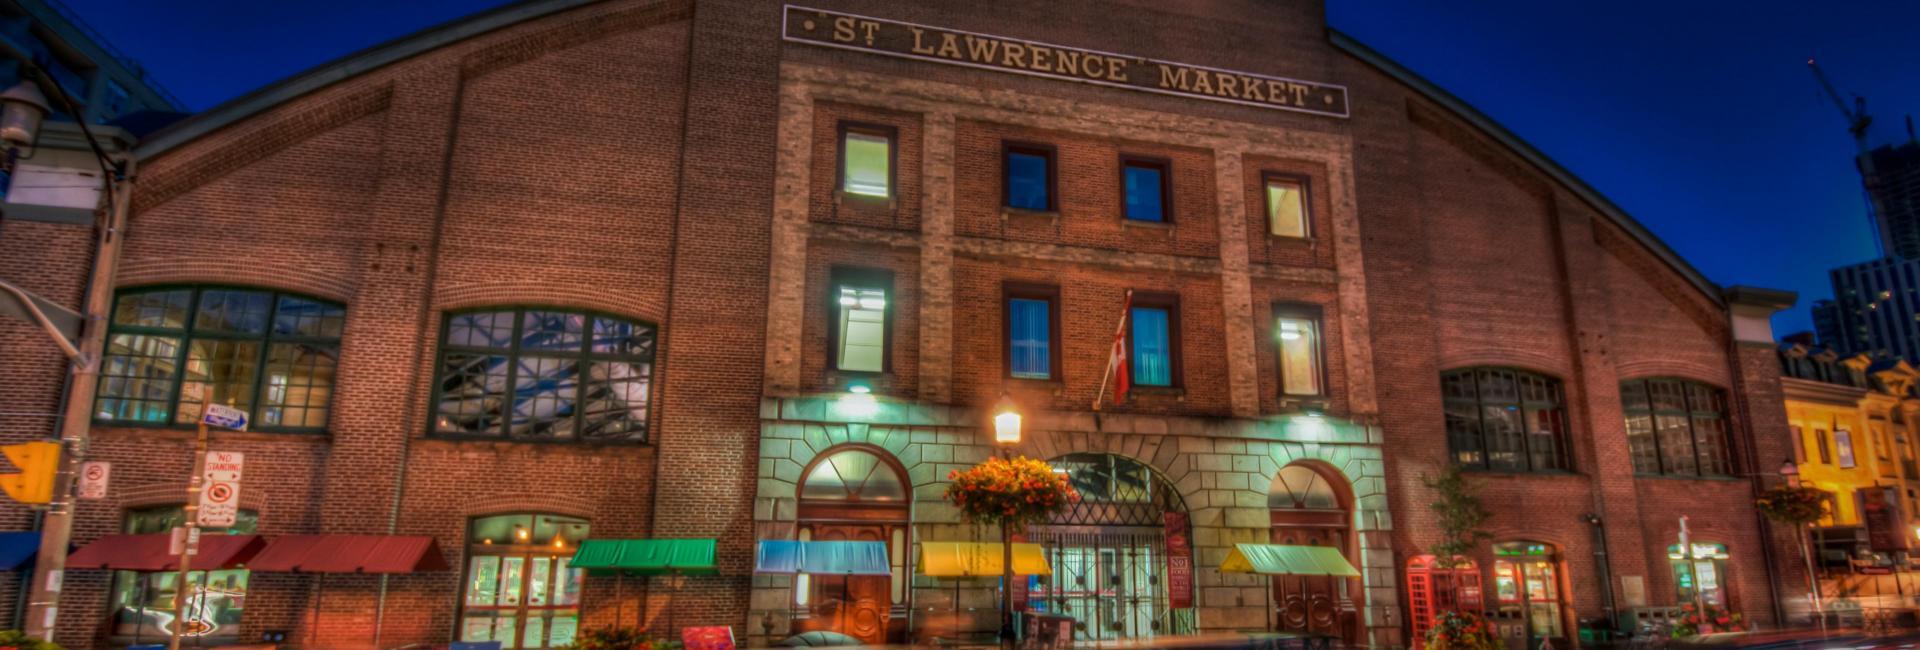 St Lawrence Market Night